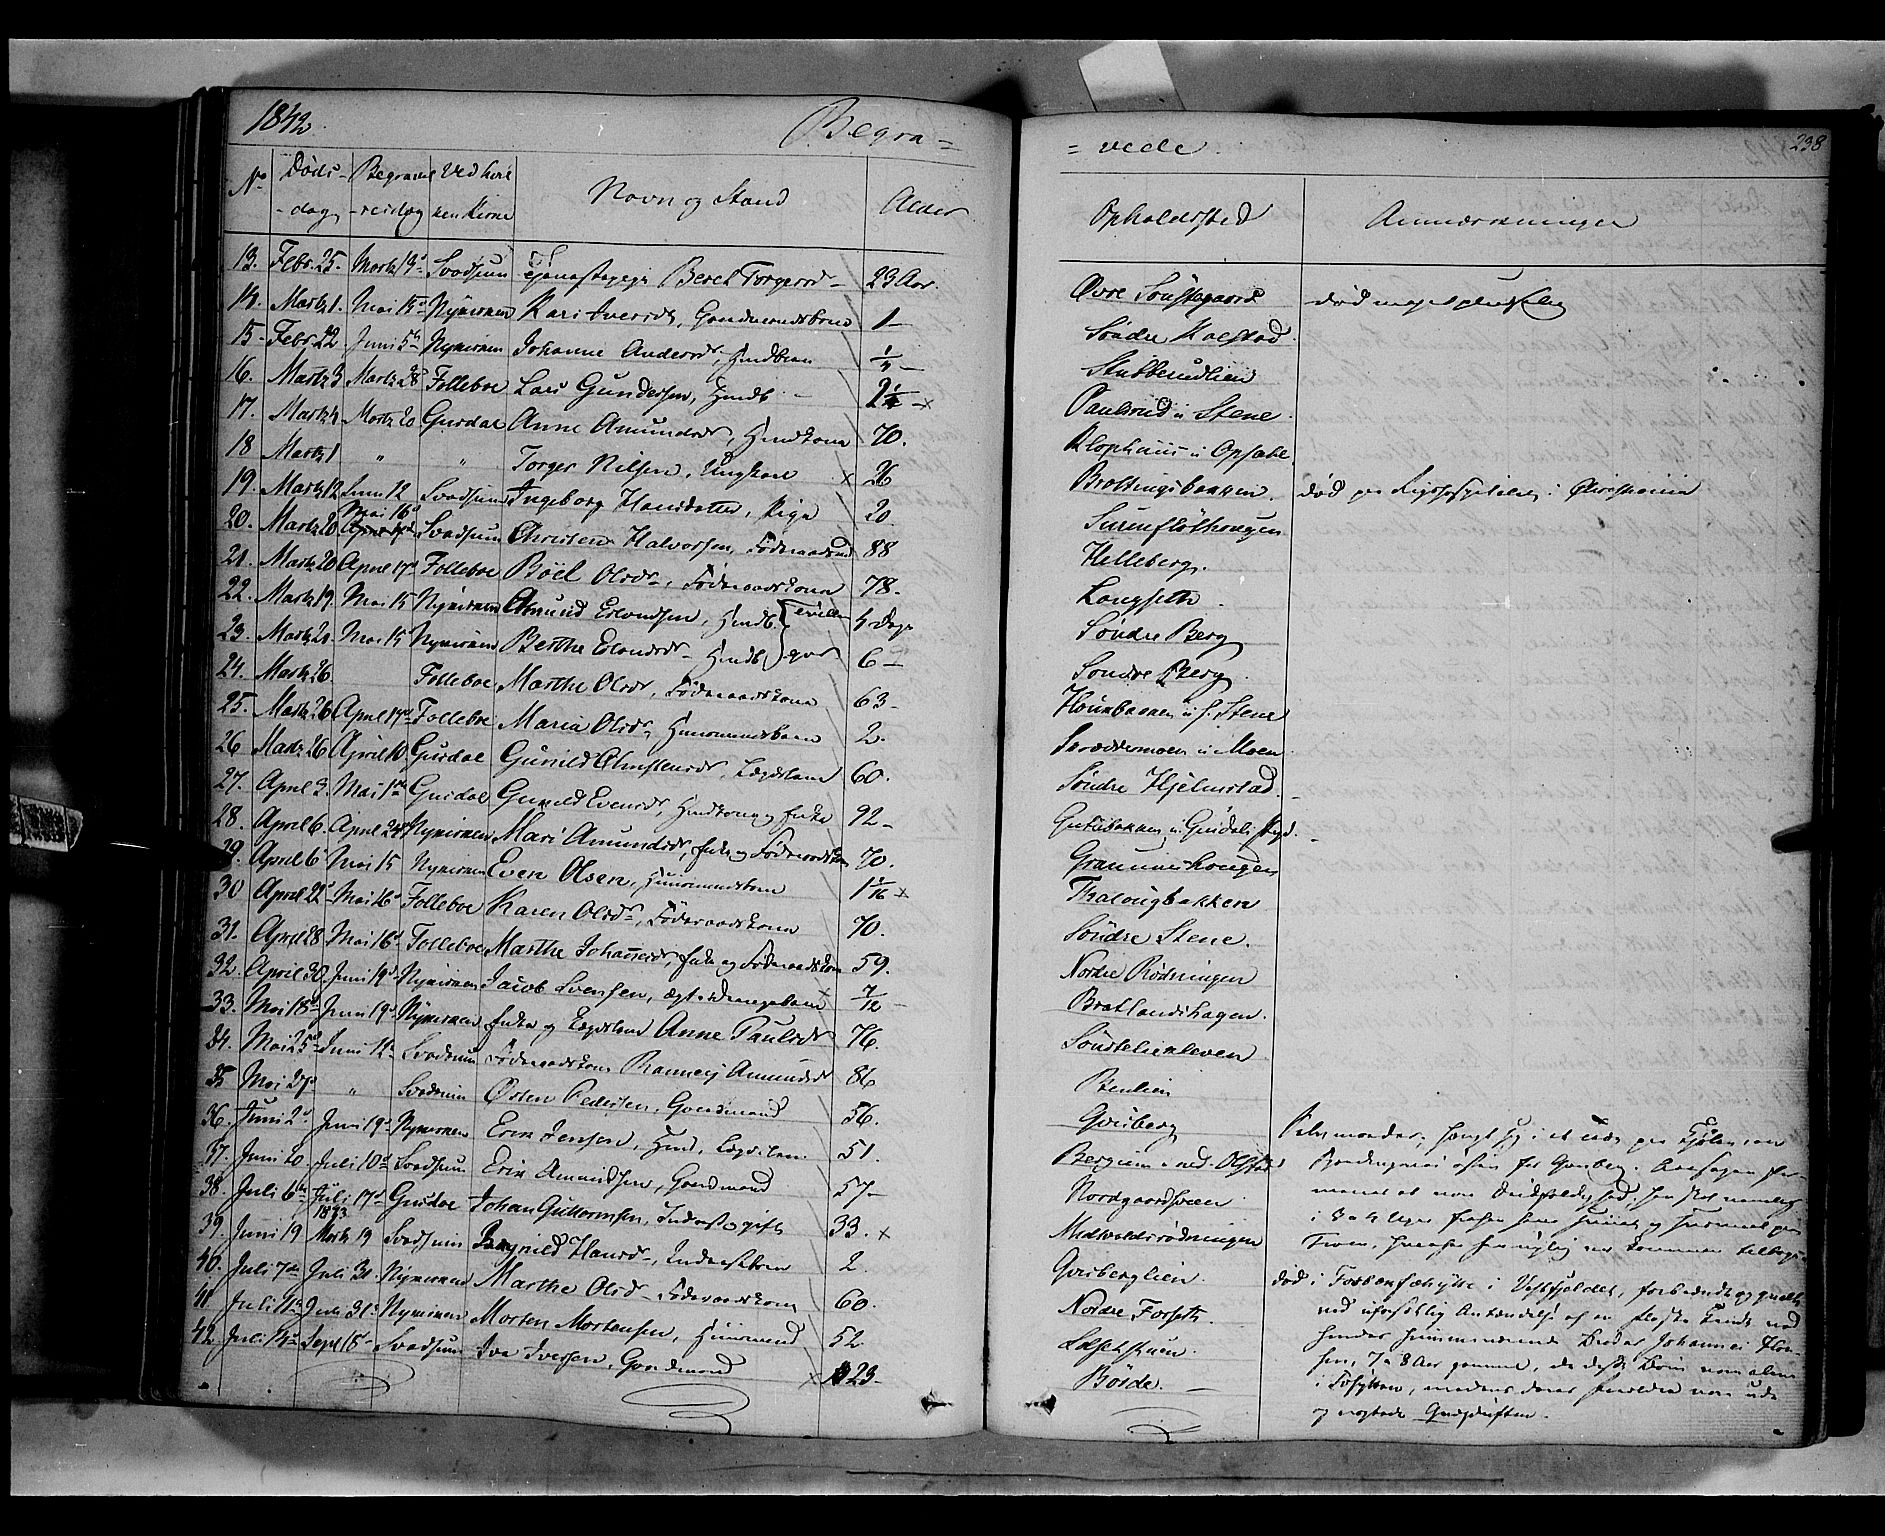 SAH, Gausdal prestekontor, Ministerialbok nr. 7, 1840-1850, s. 238